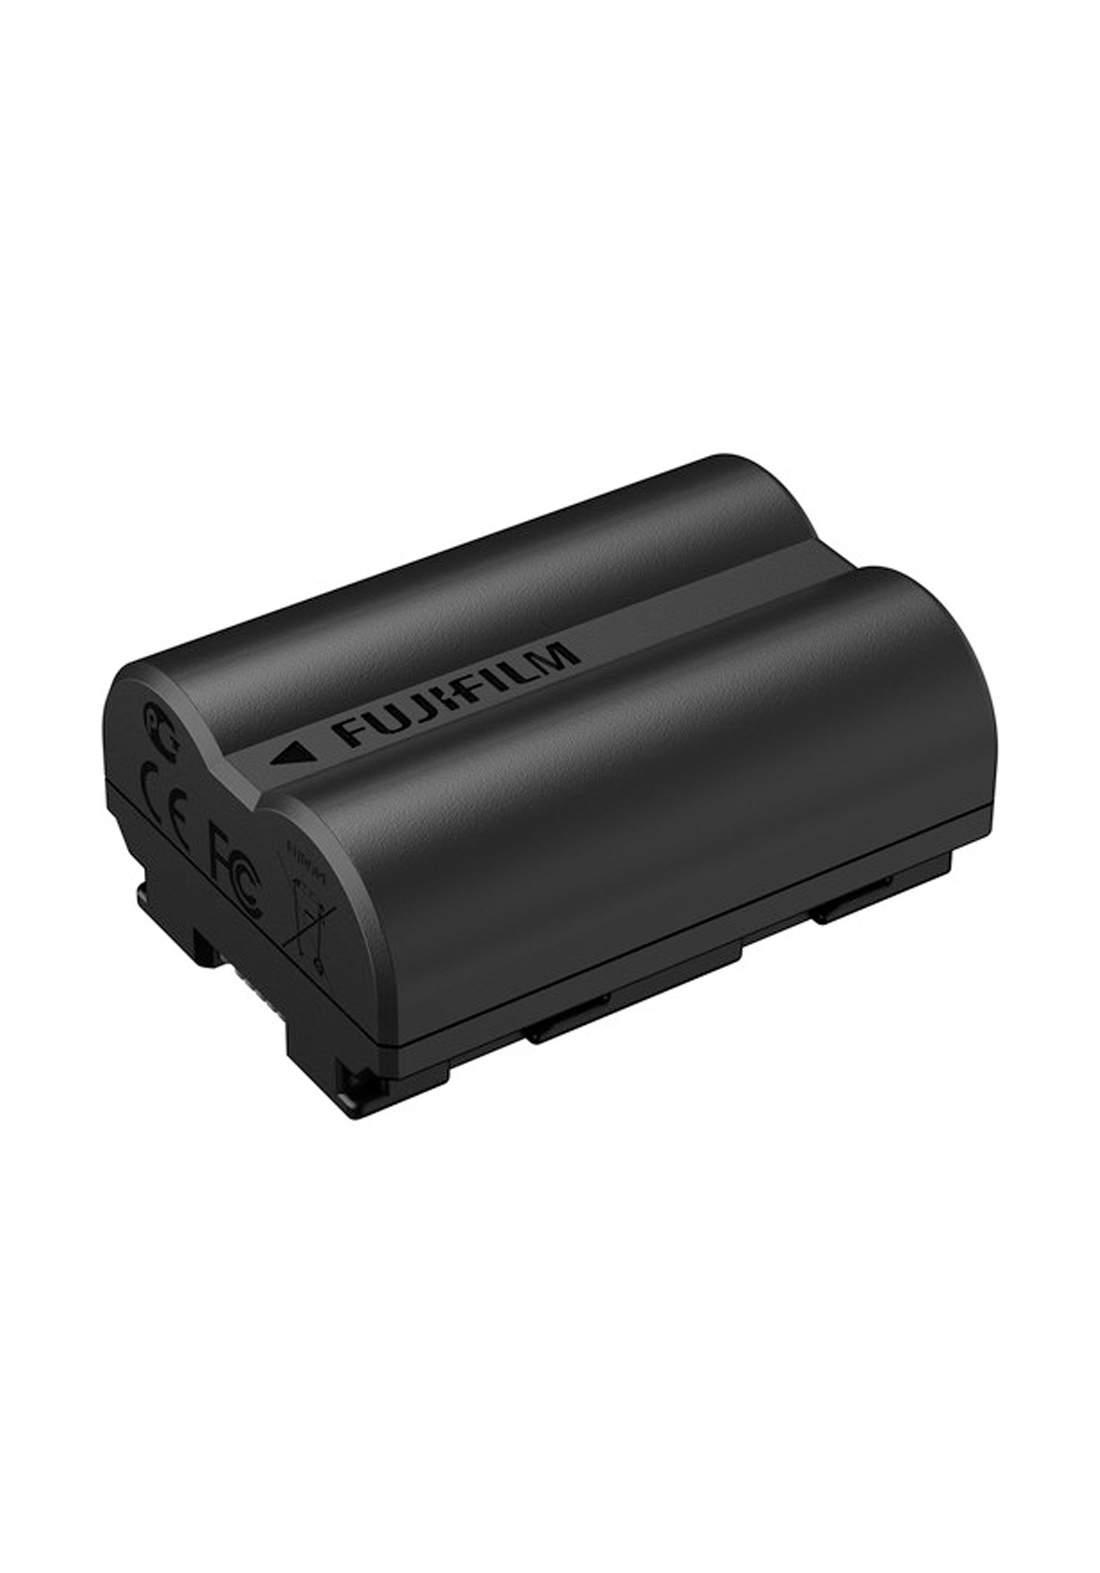 Fujifilm NP-W235 (X-T4) Lithium-Ion Battery  - Black  بطارية كاميرا